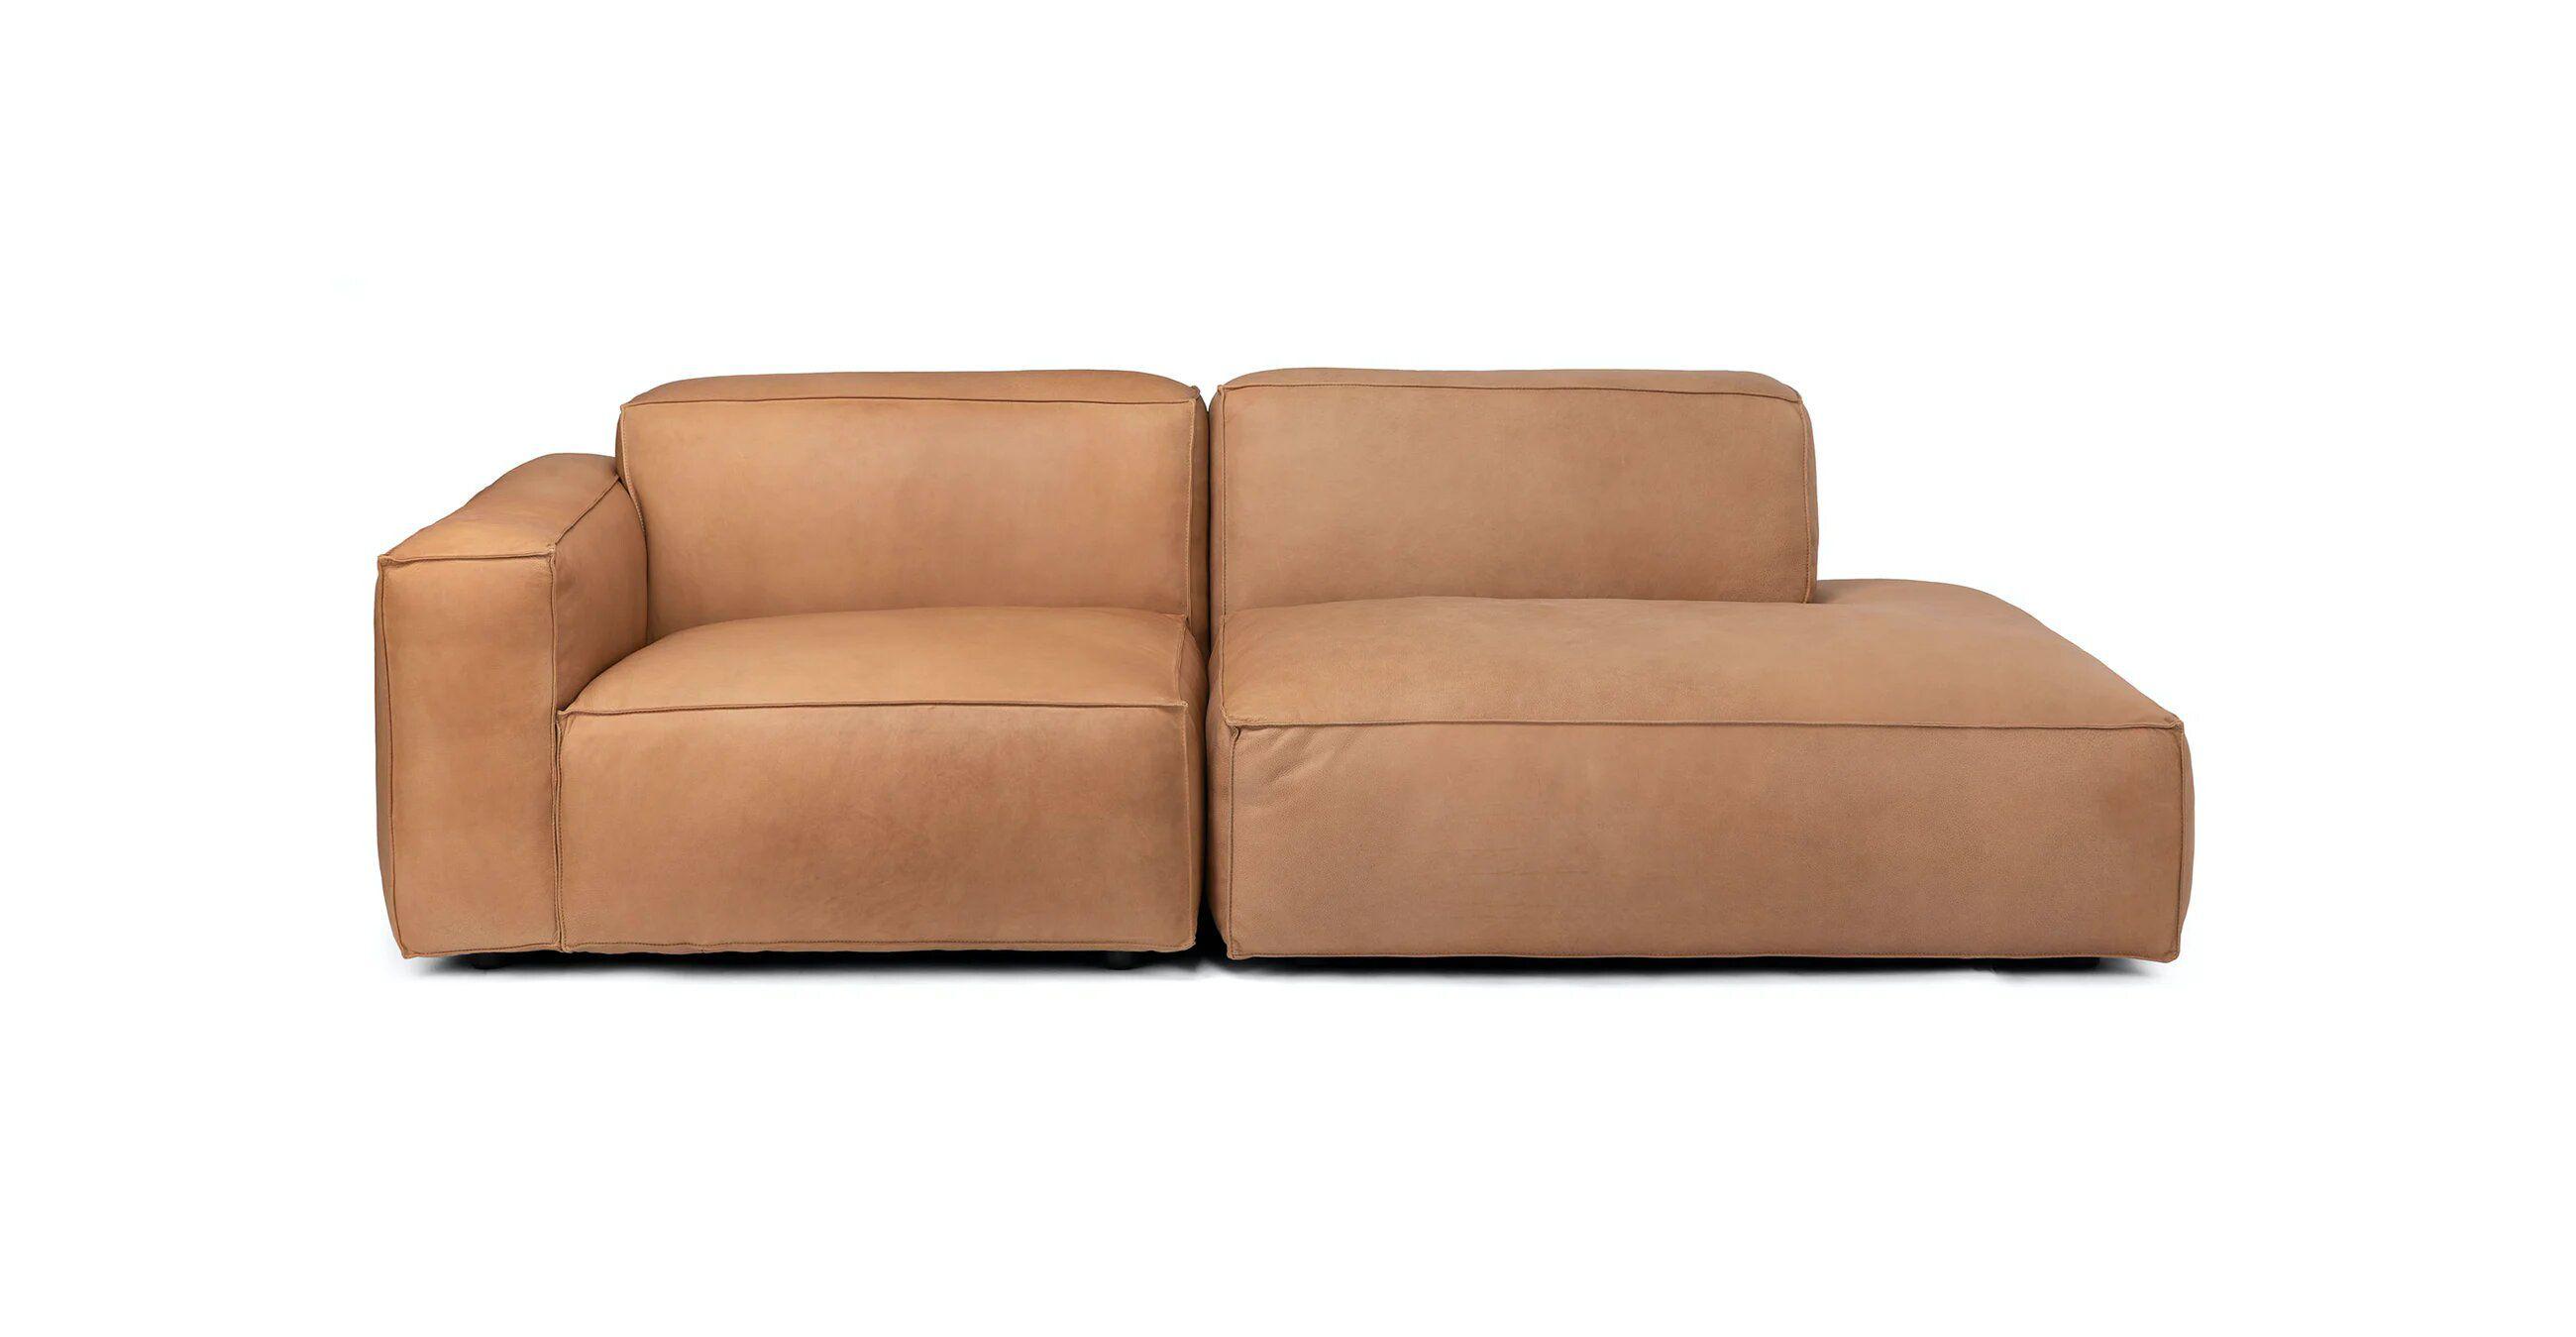 Solae Modular Sofa